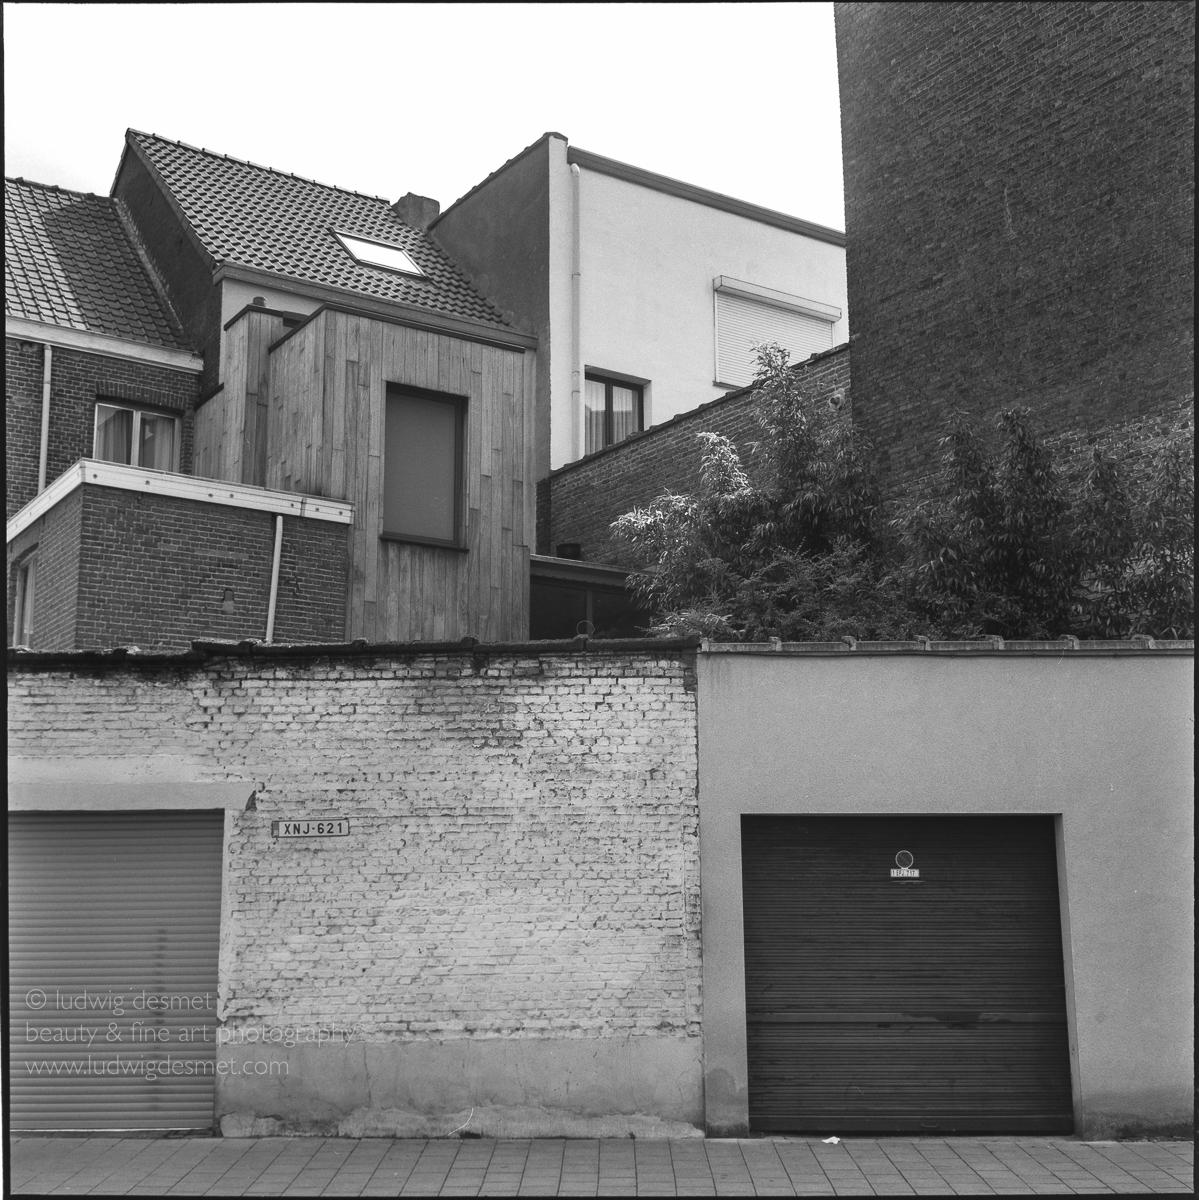 LudwigDesmet_aug2016-2365